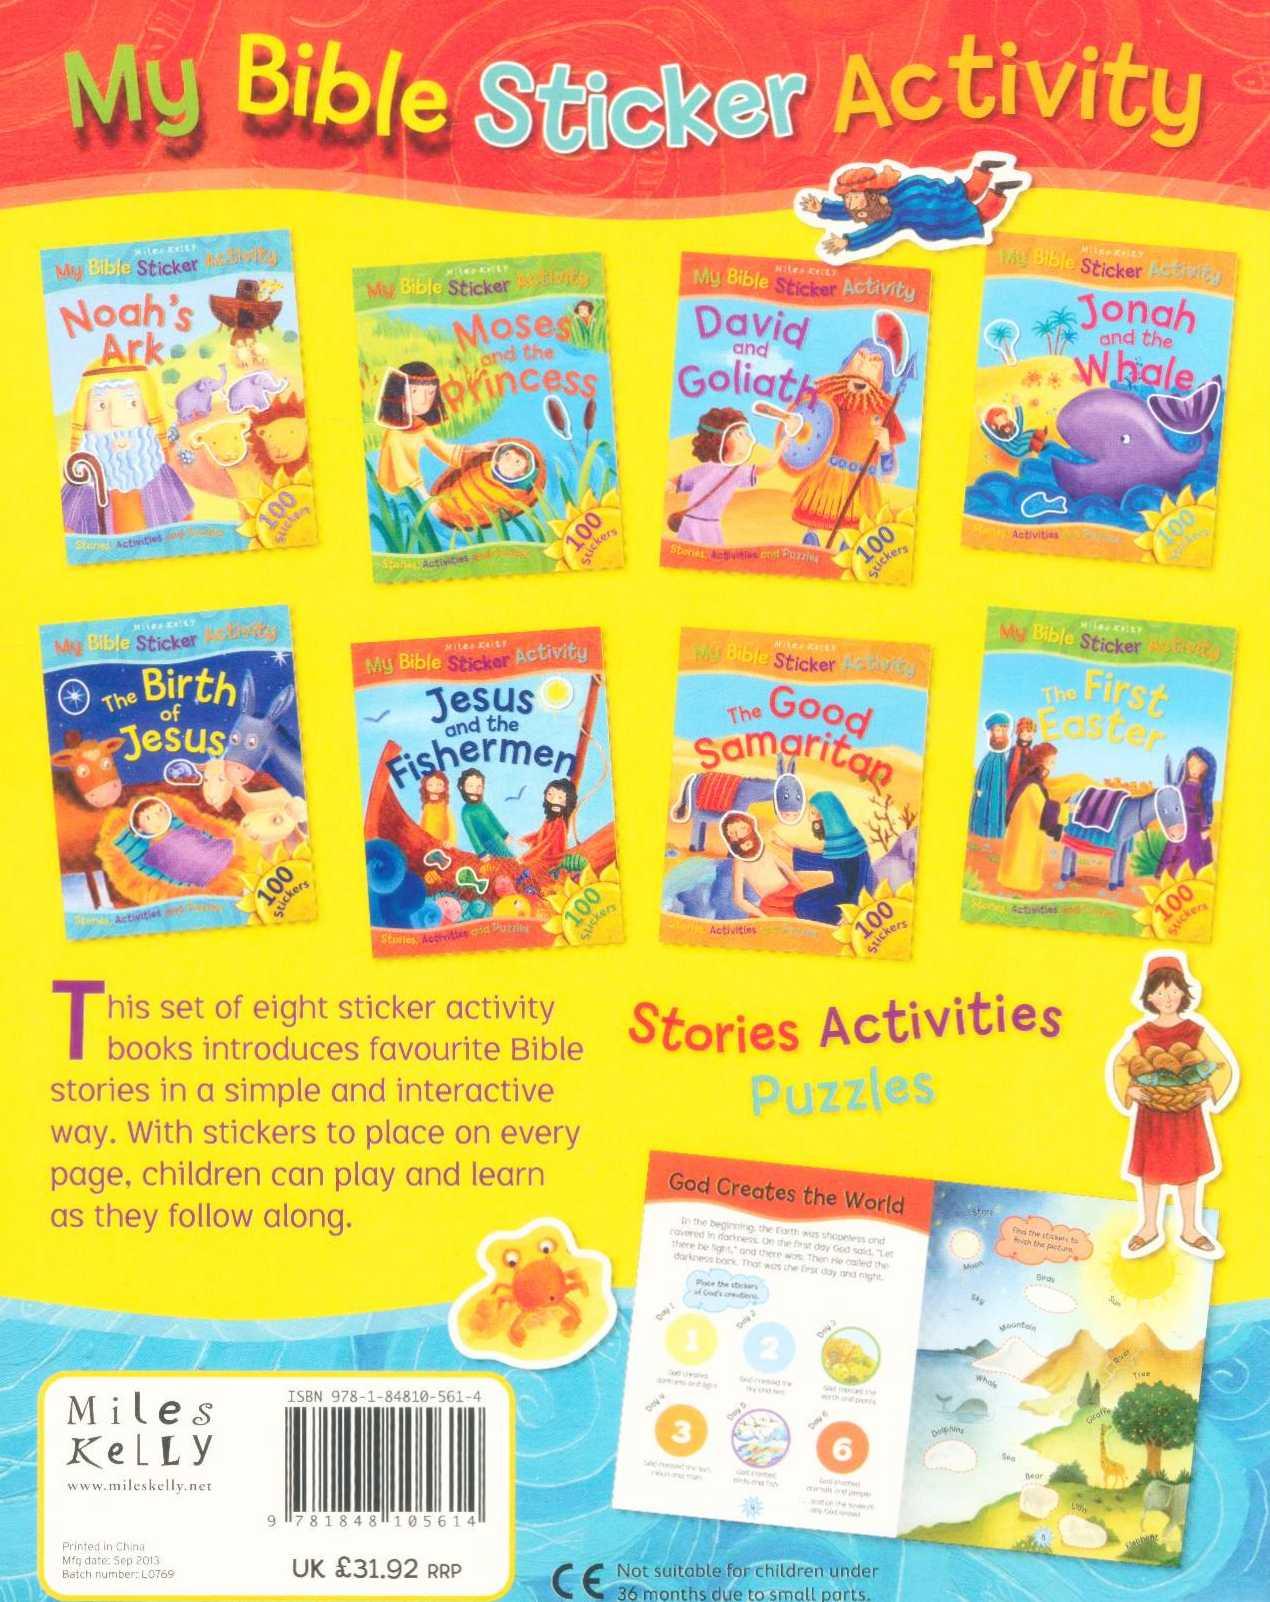 My Bible Sticker Activity - Eight Book Pack, Stories Activities